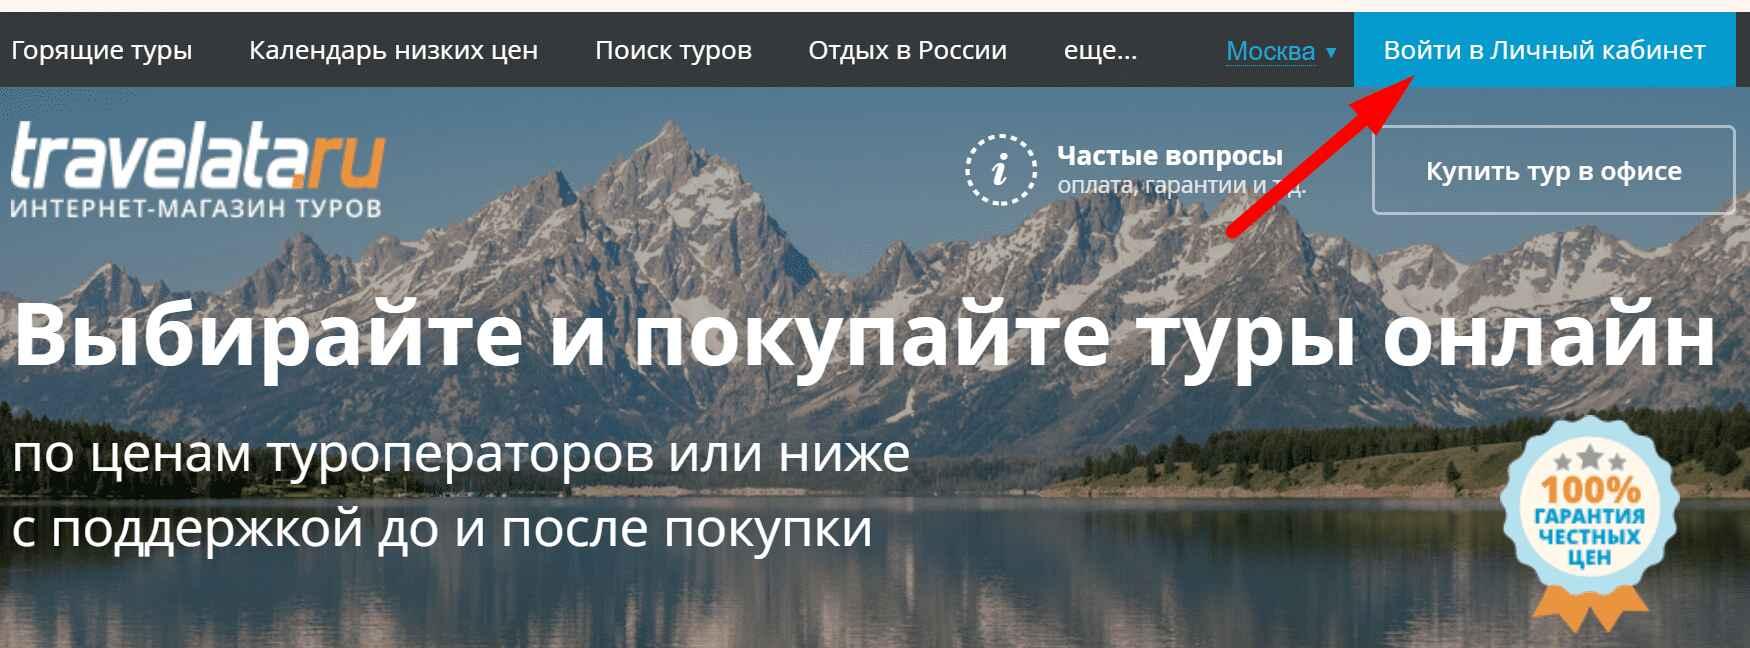 Официальный сайт онлайн сервиса «Травелата»